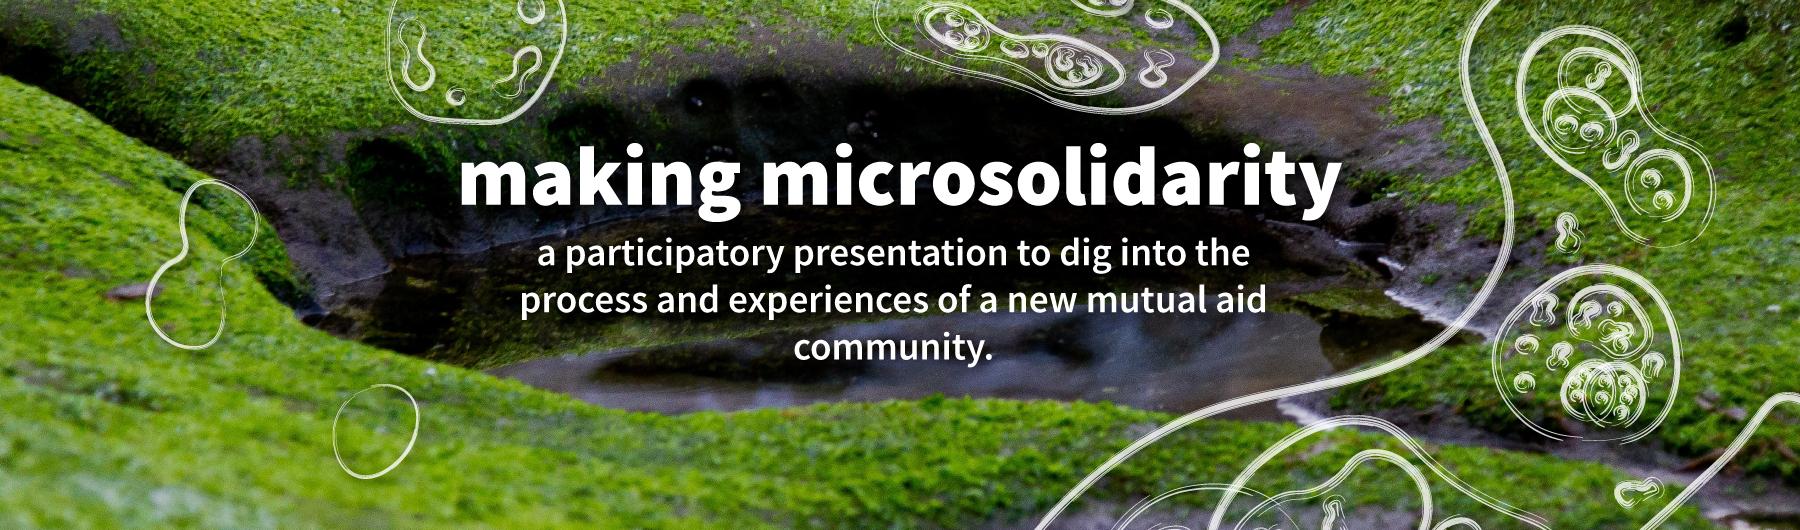 Making Microsolidarity in Maastricht